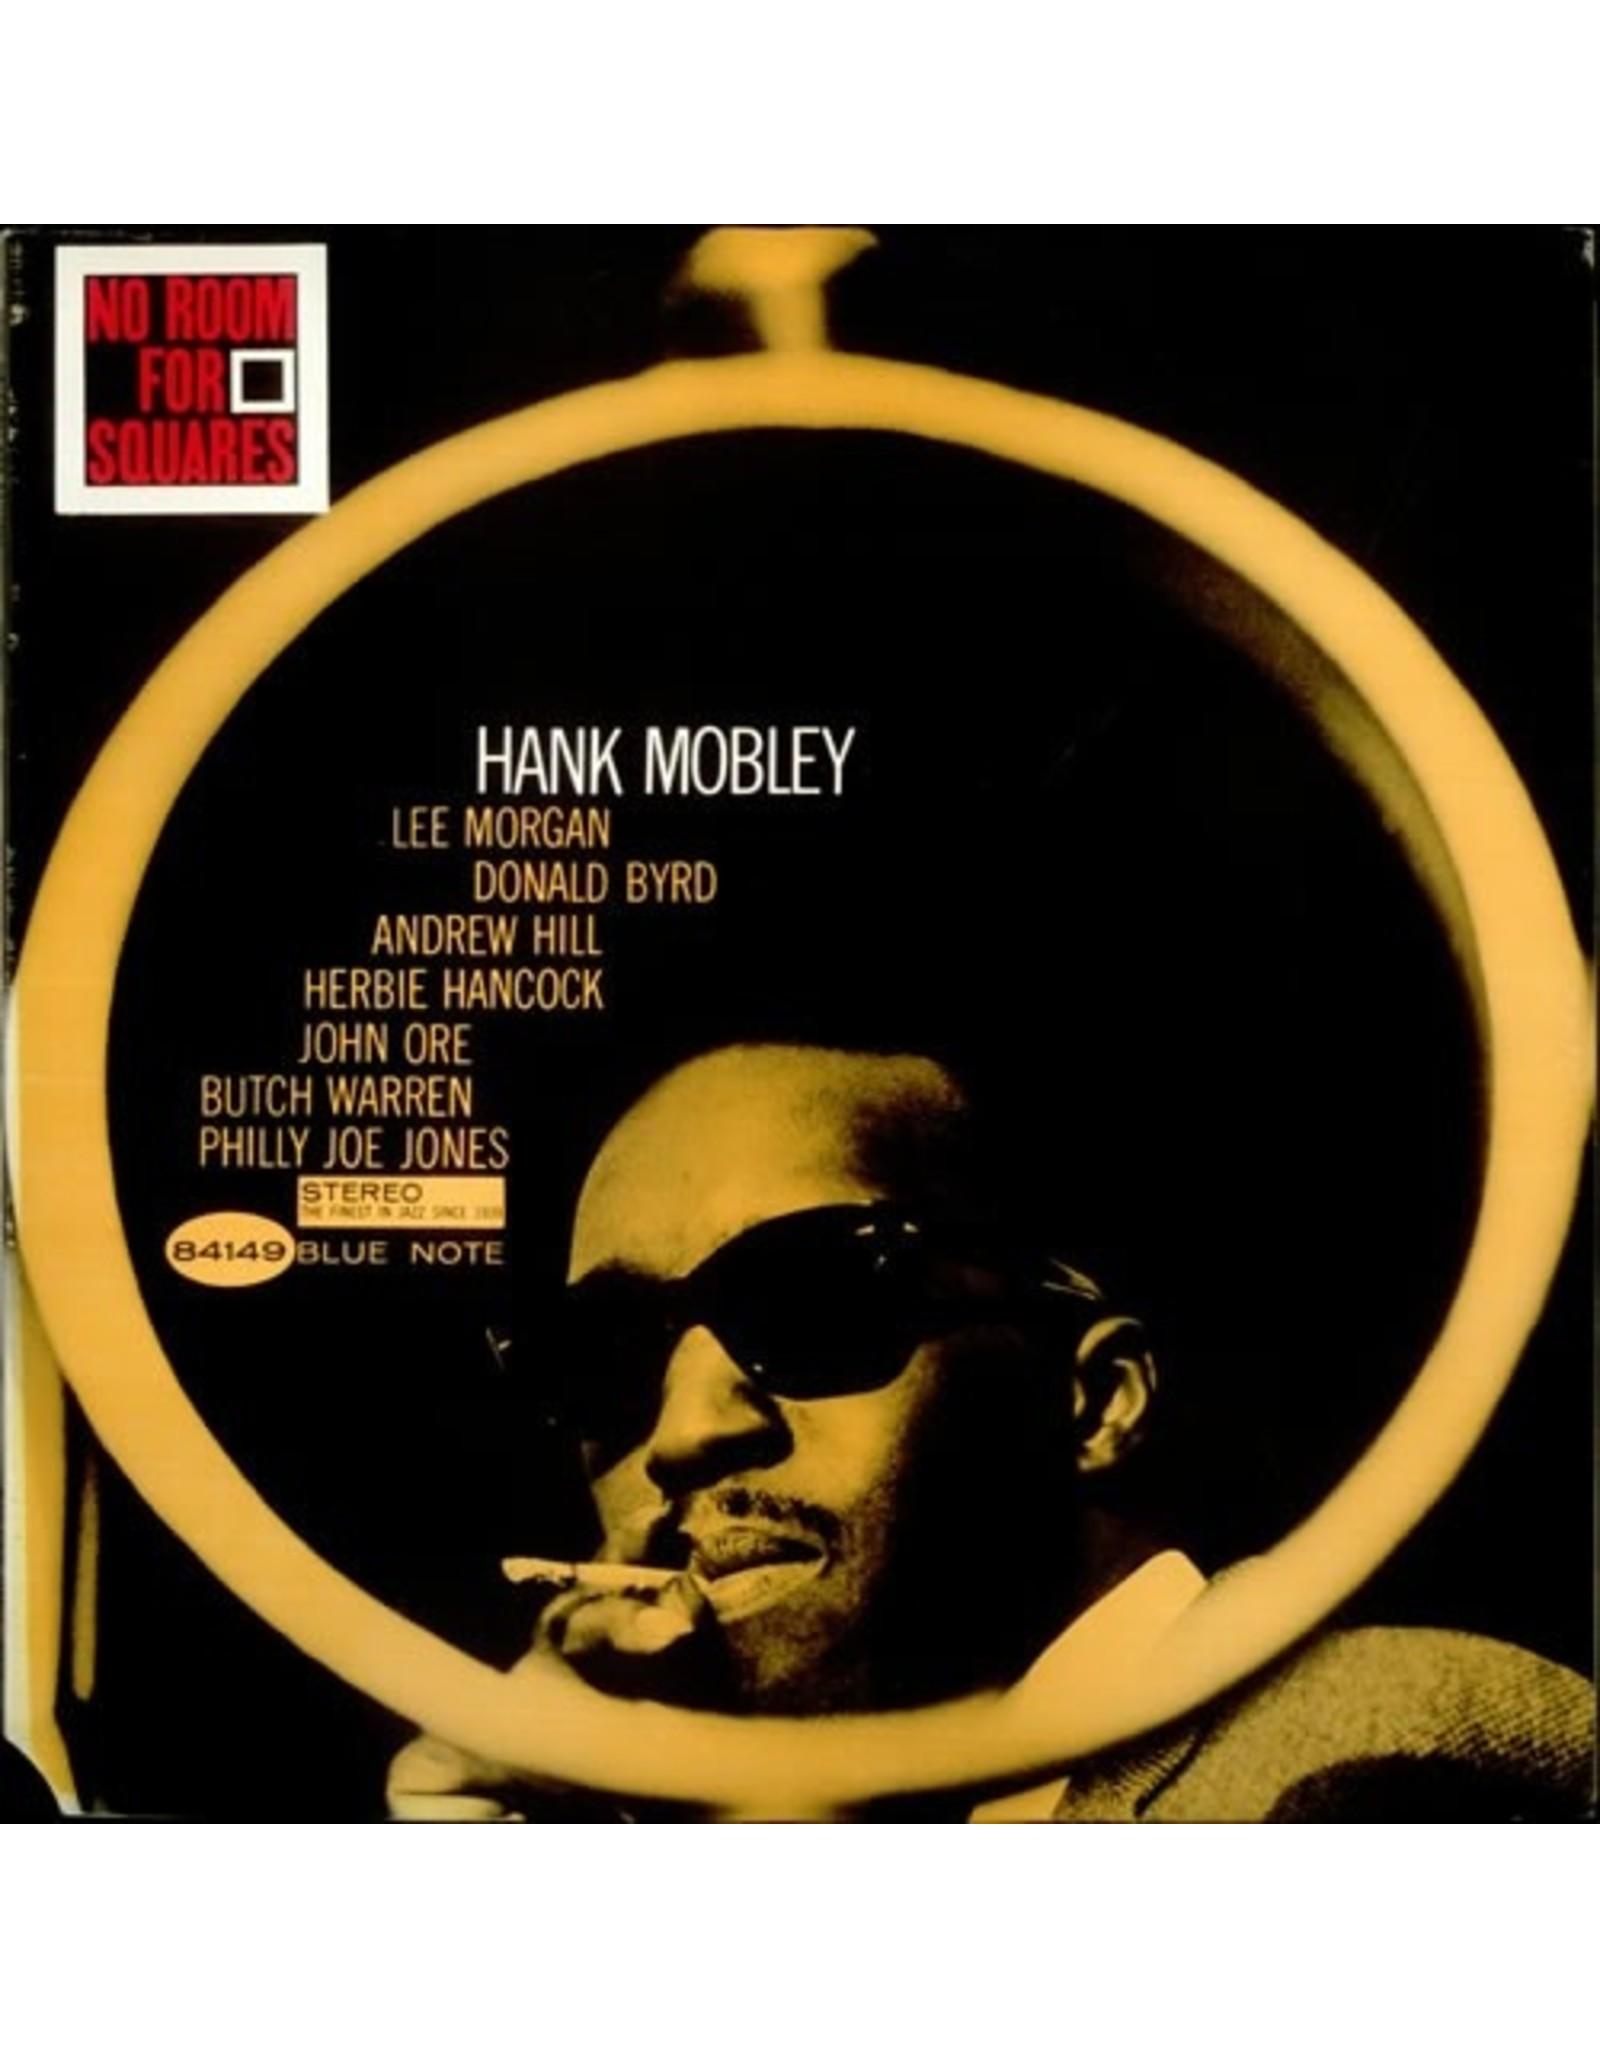 New Vinyl Hank Mobley - No Room For Squares LP